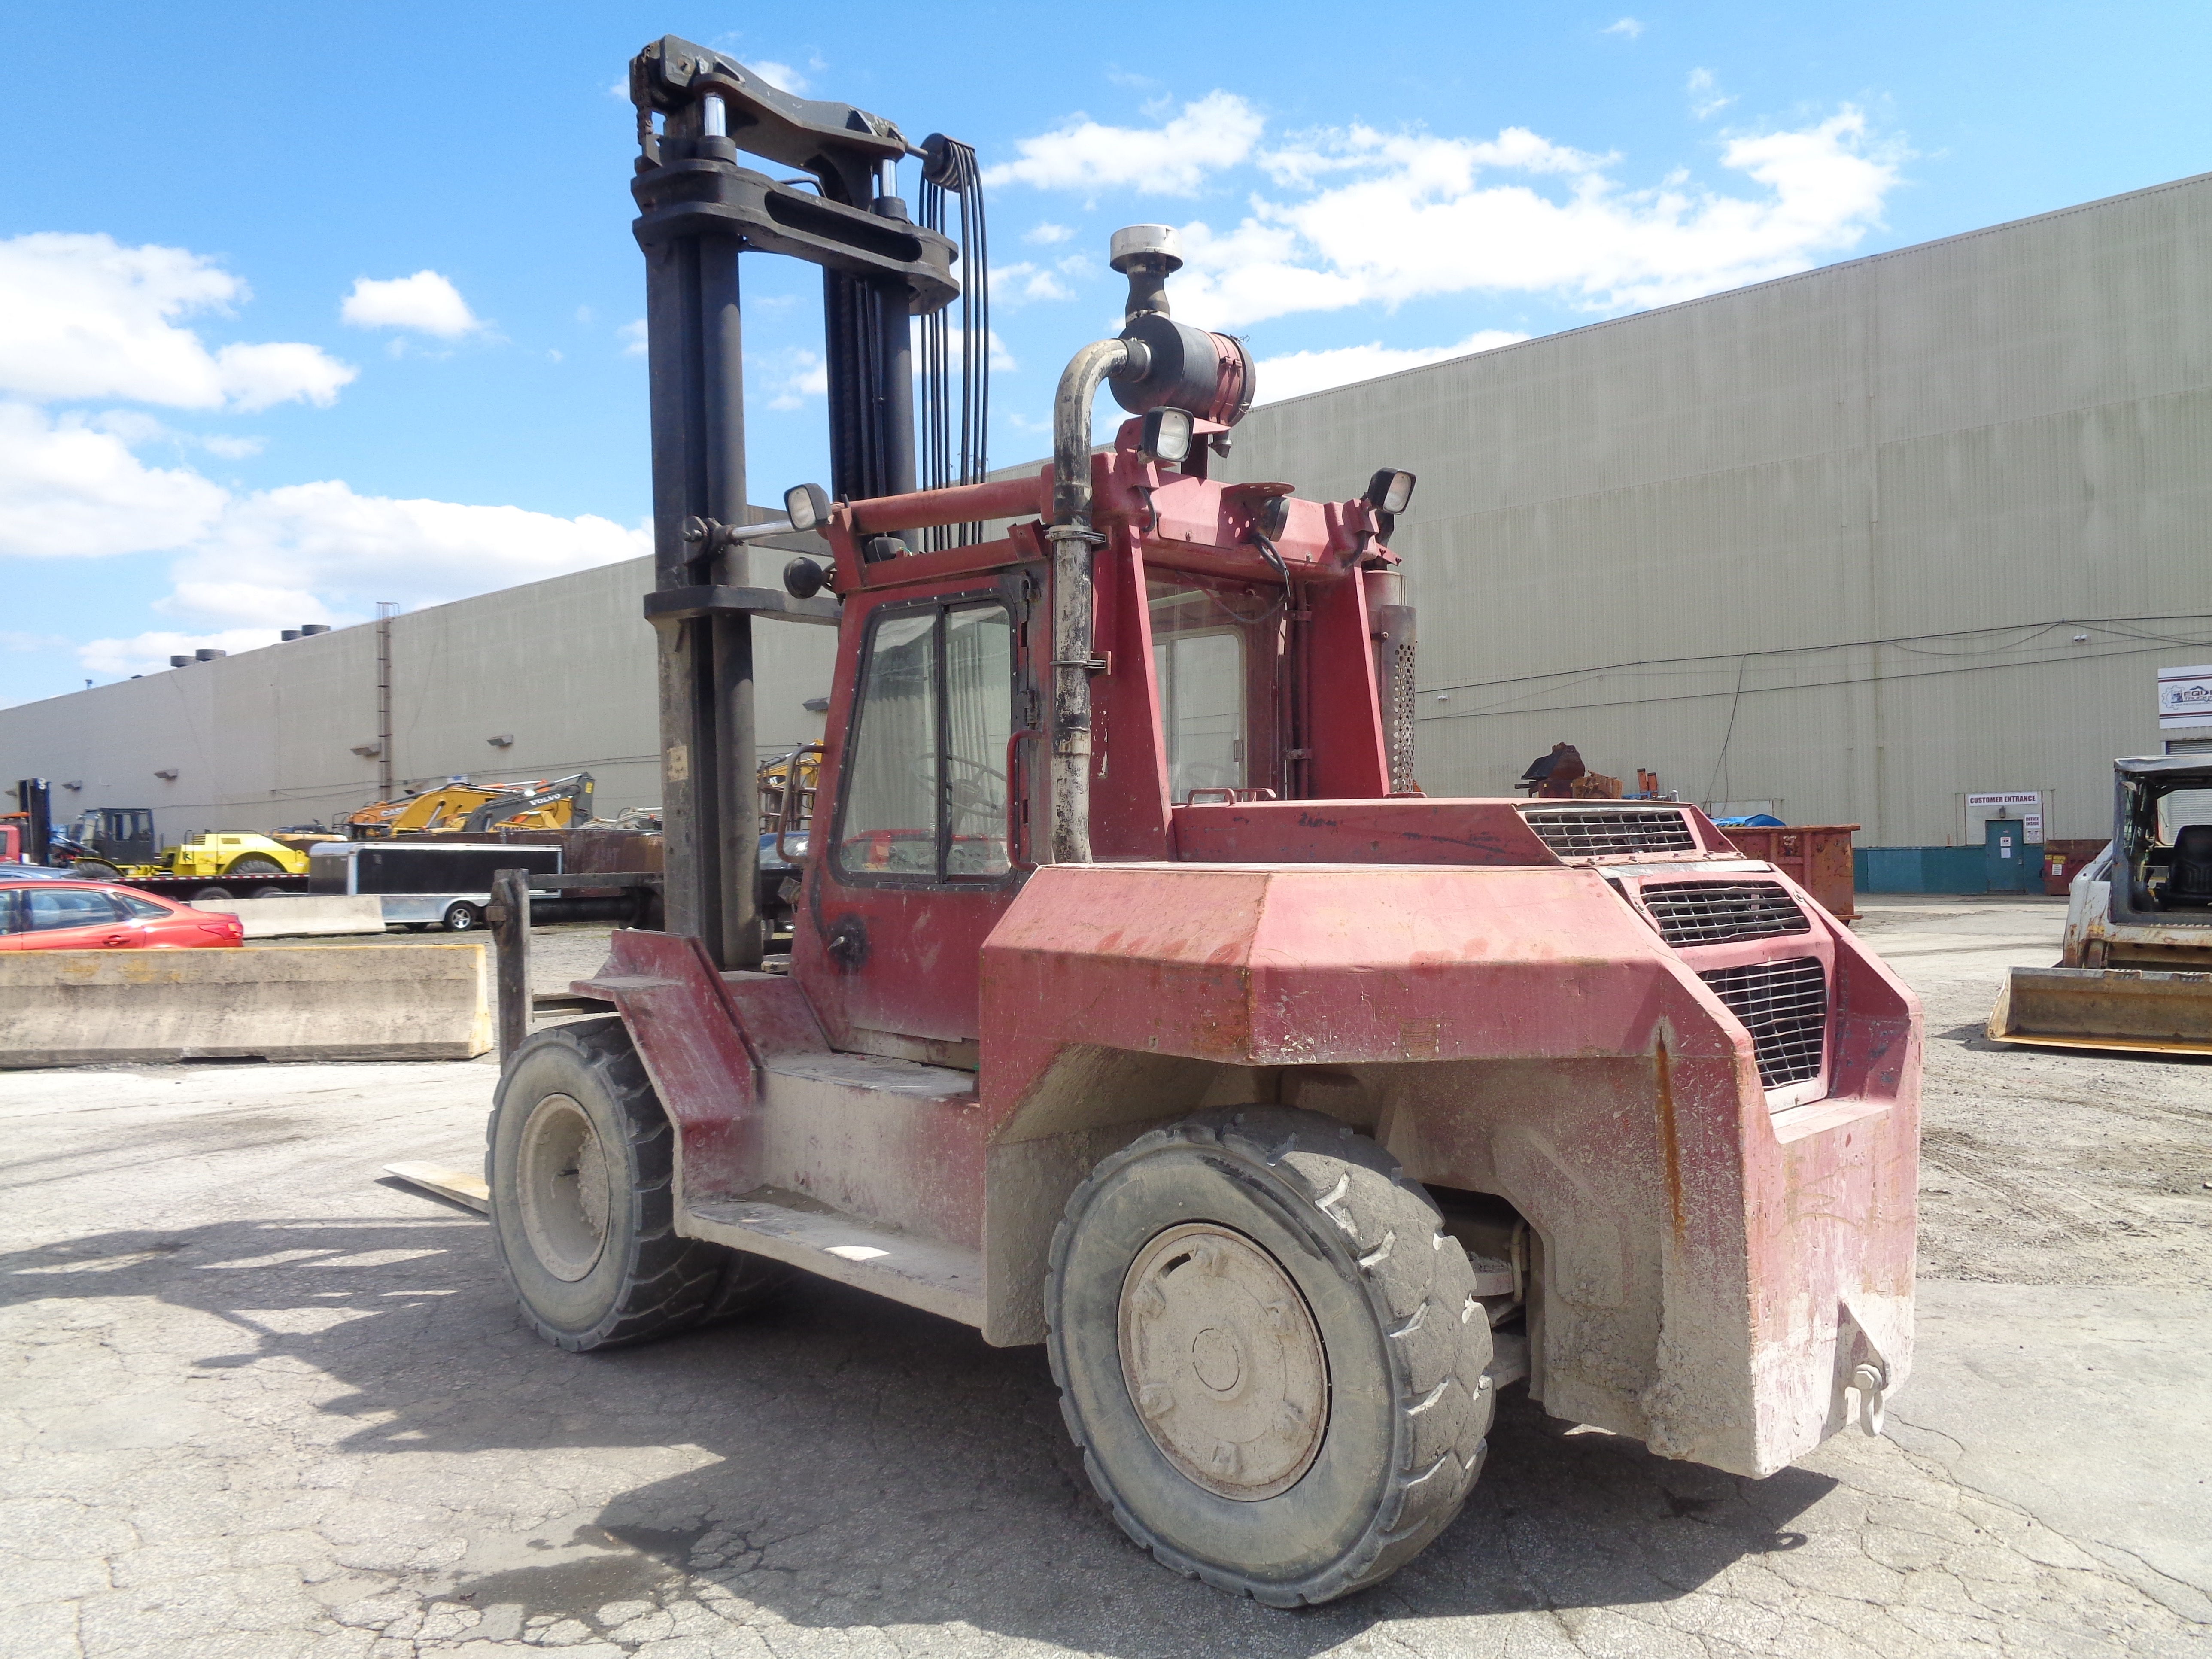 Lot 56 - 1990 Taylor TE300S 30,000 lb Forklift